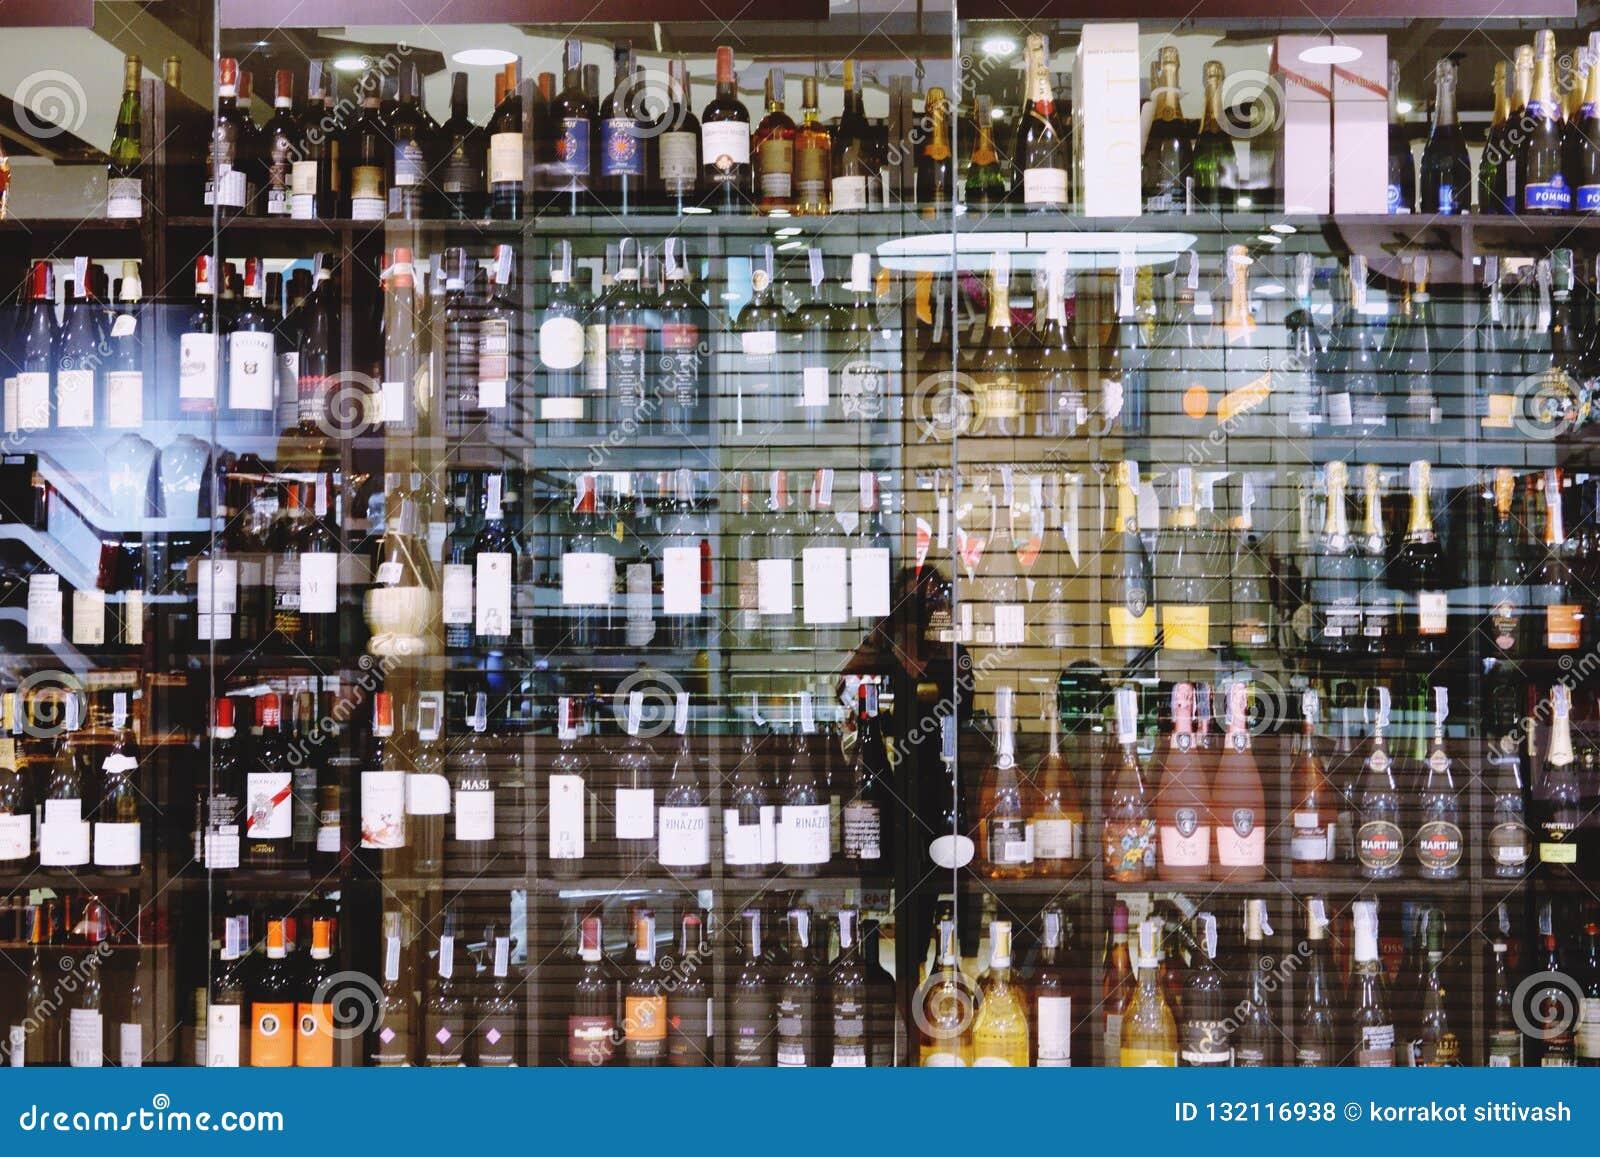 Suan luang Thailand 17 november 2018 alkoholiserat lager